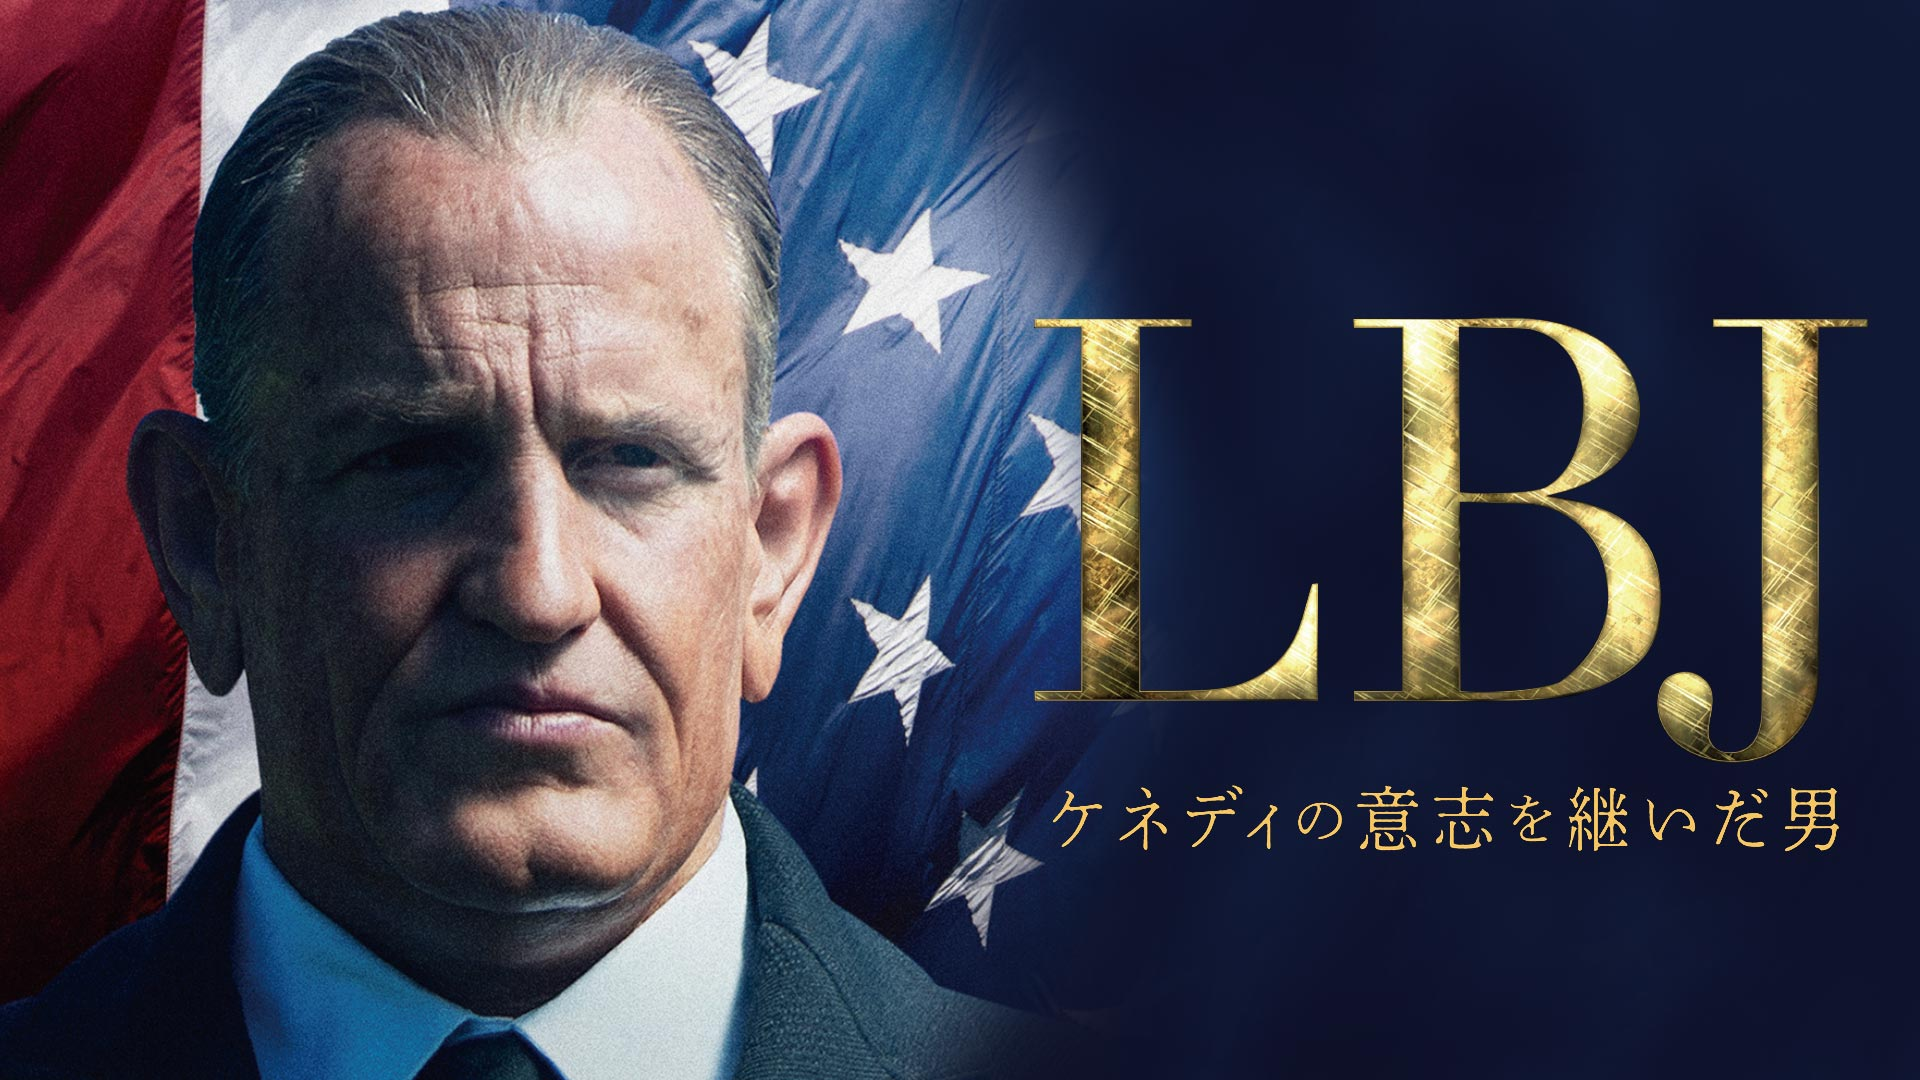 LBJ ケネディの意志を継いだ男 (字幕版)